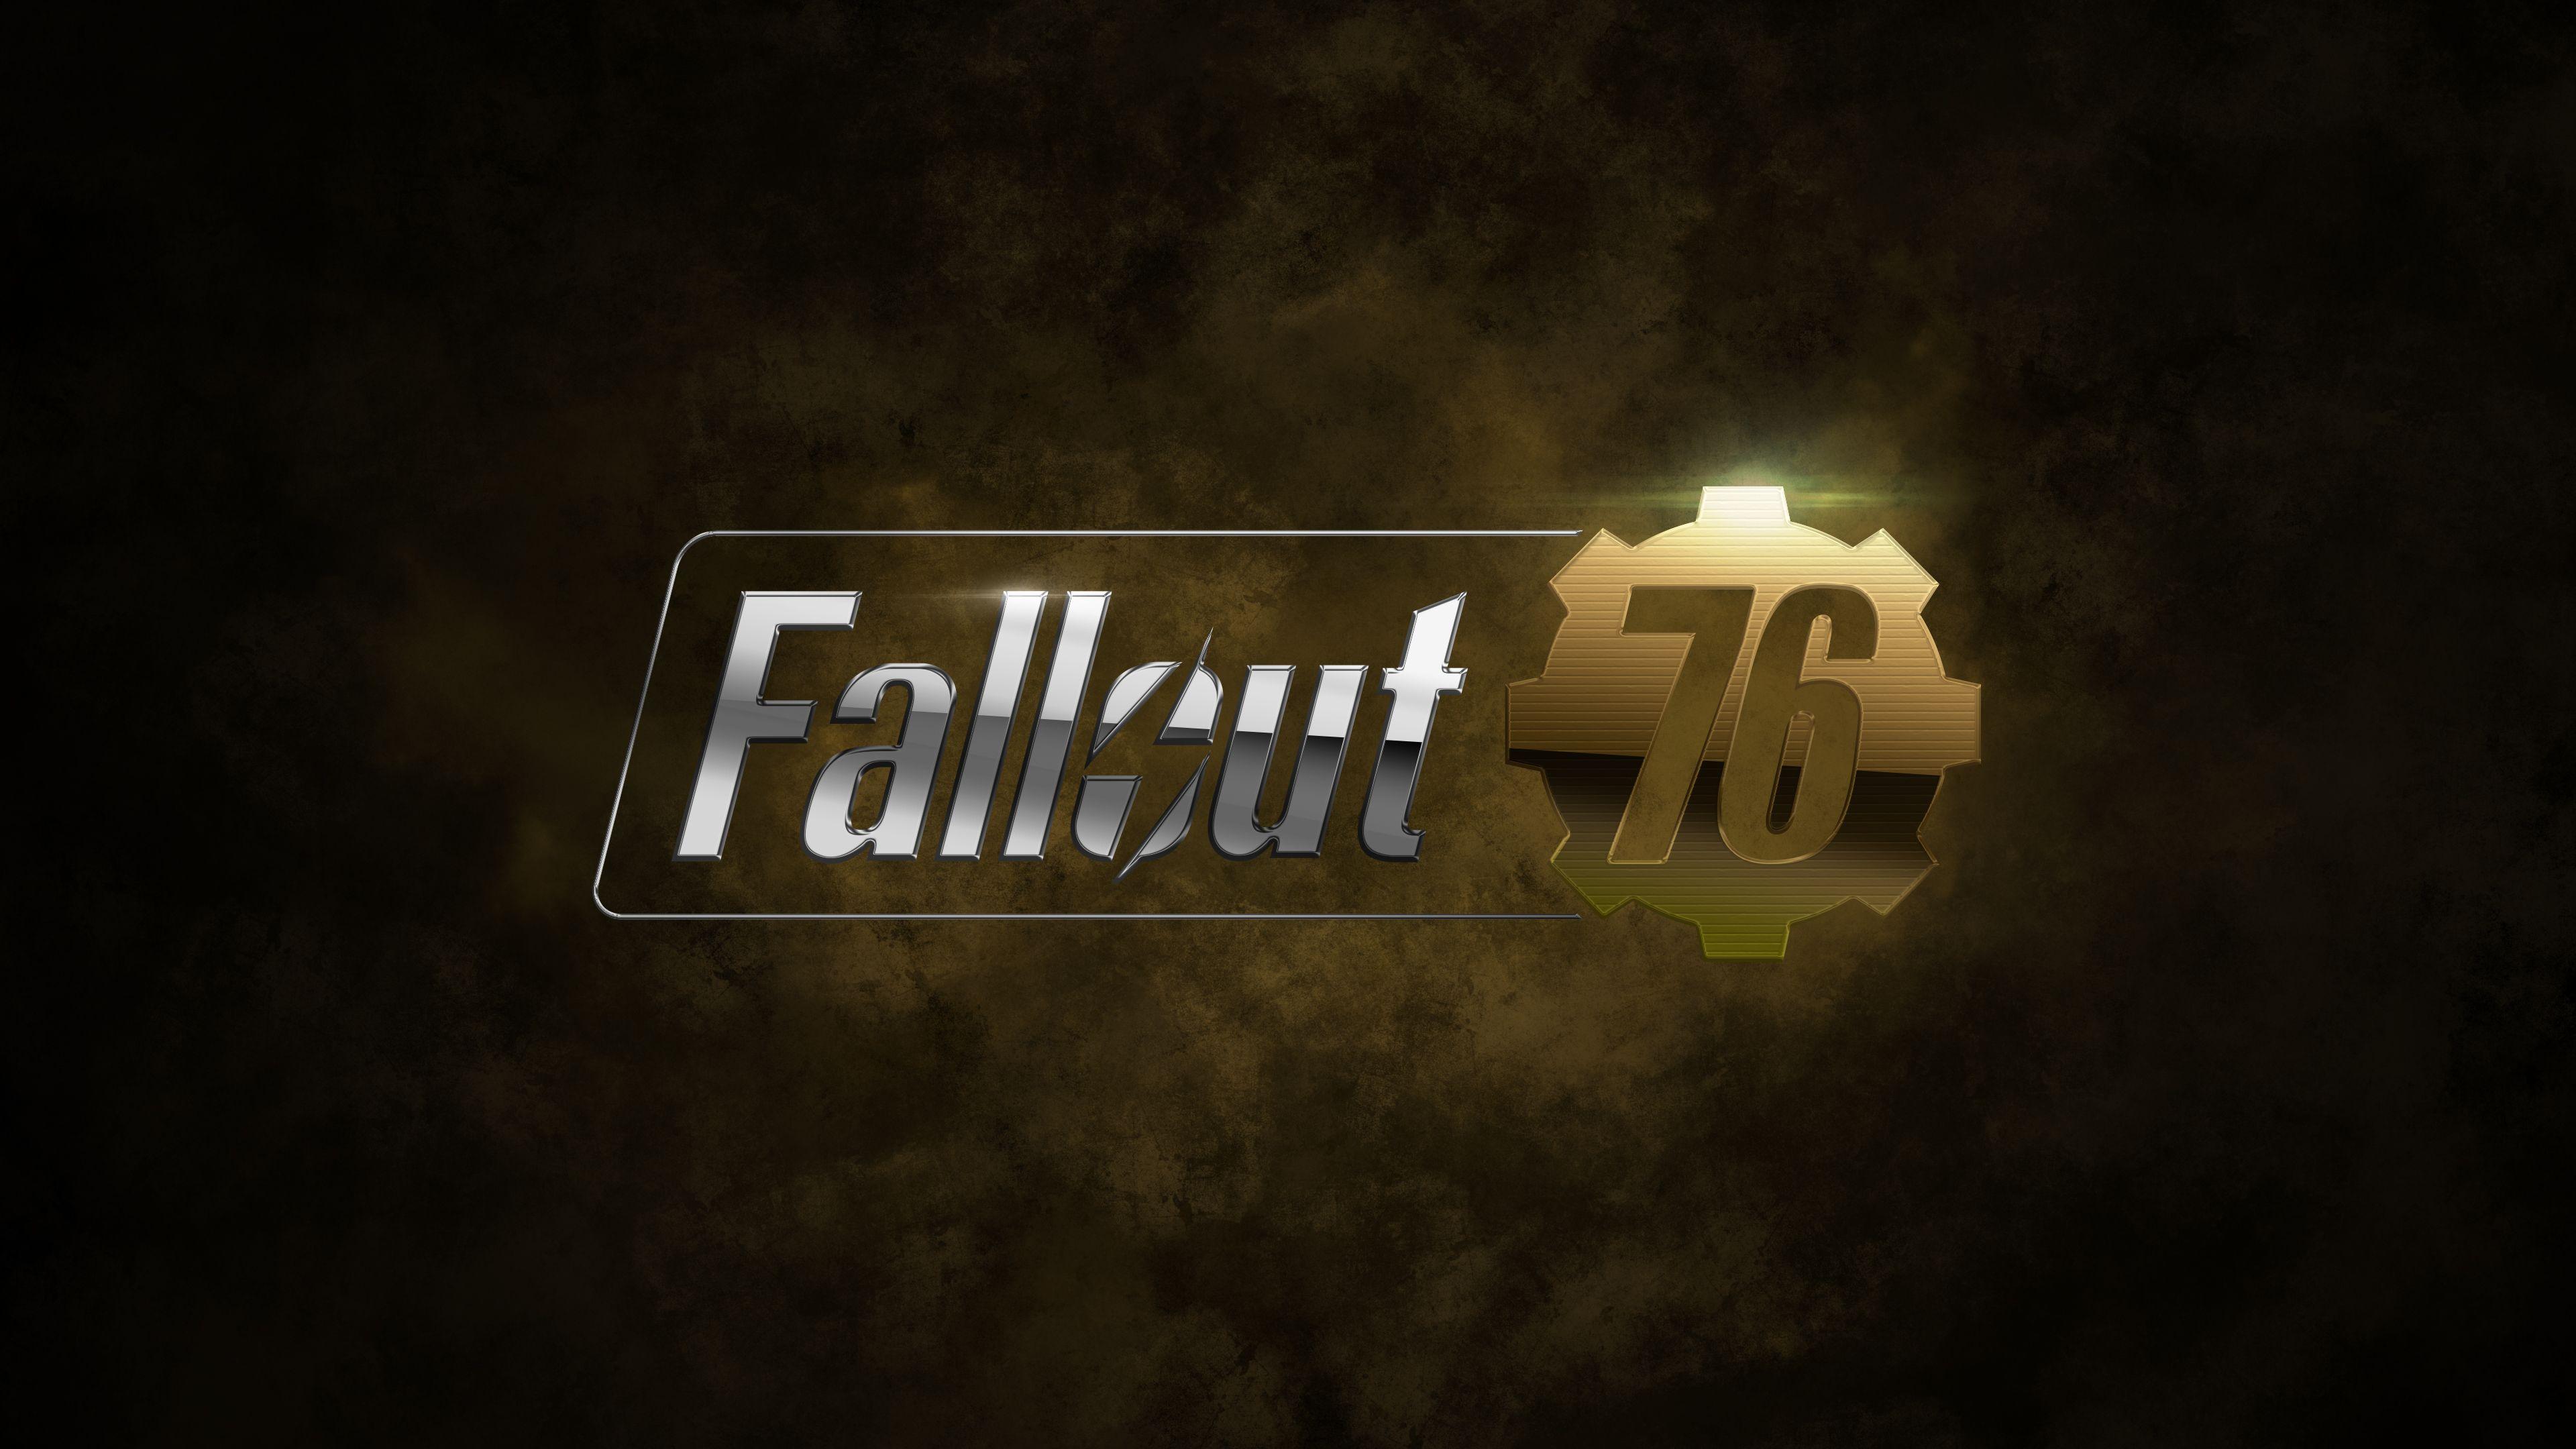 Fallout 76 Game Logo 4k Hd Wallpapers Games Wallpapers Fallout 76 Wallpapers Deviantart Wallpapers 4k Wallpap Fallout Wallpaper Game Logo Gaming Wallpapers